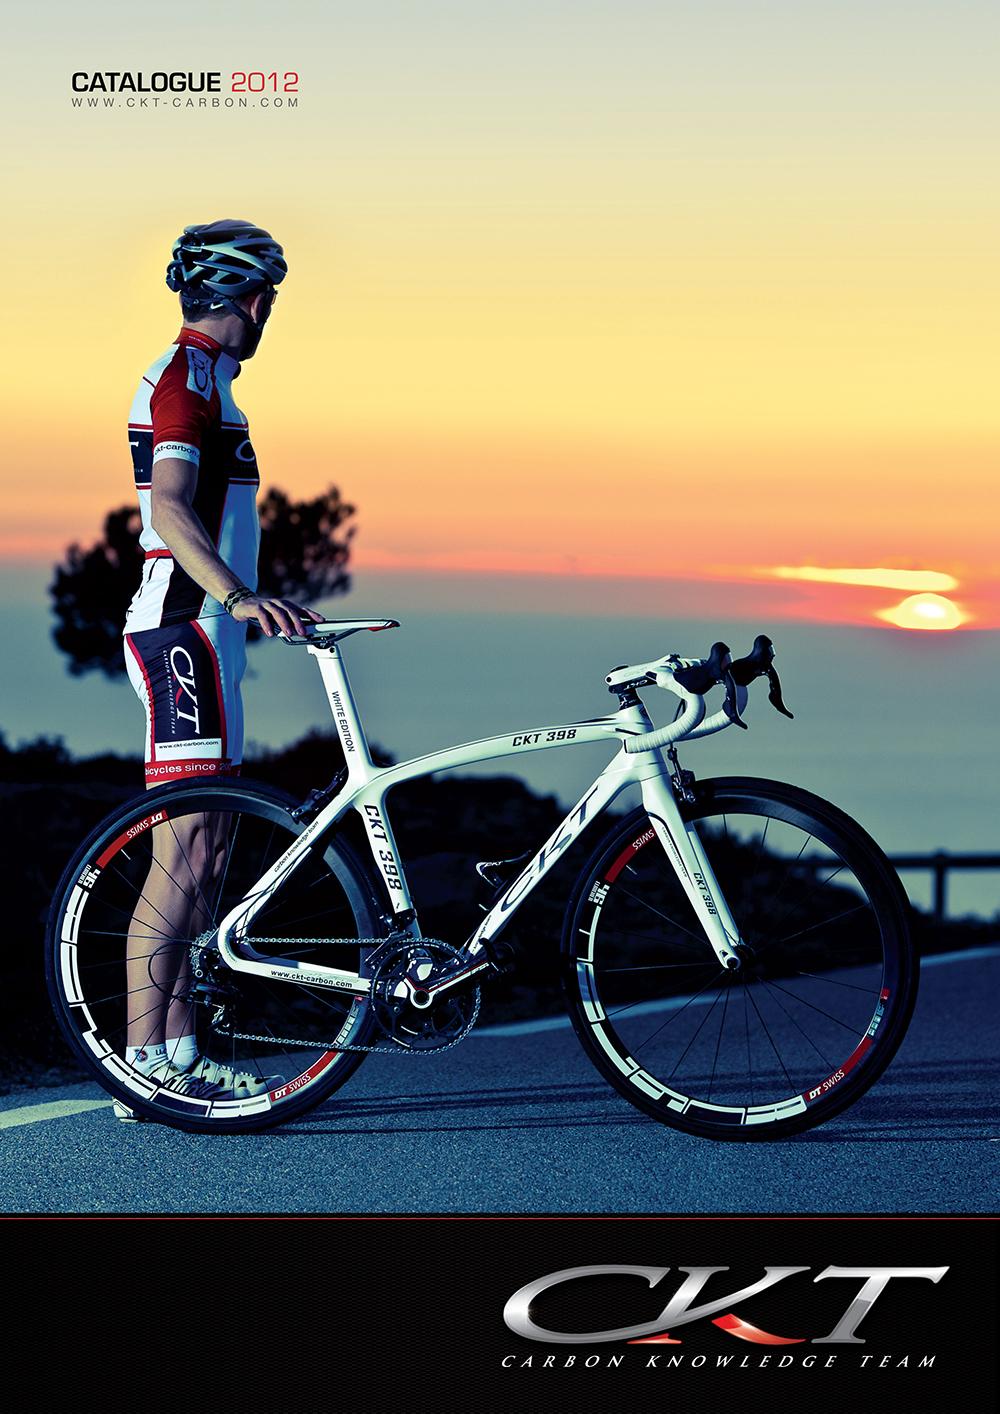 up-cycling-remi-chenu-experience-expert-velo-vente-dossier-presse-magazine-engineerin-design-cycling-chenu-carbon-fiber-frame